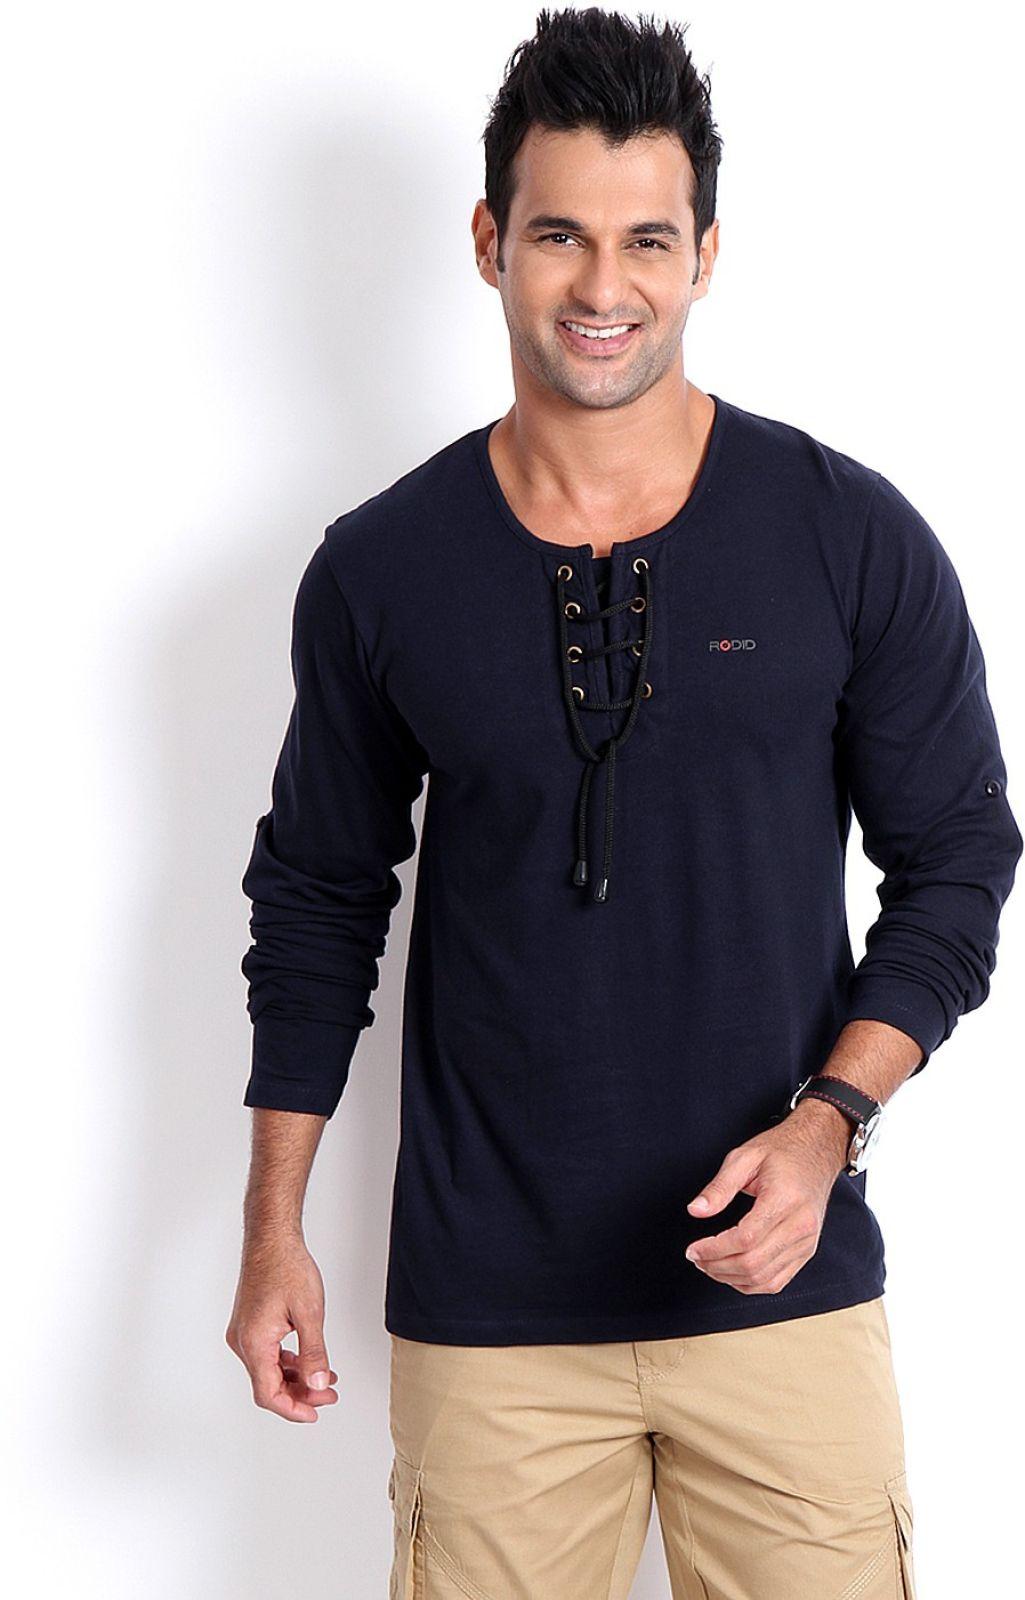 Rodid Solid Menrs Henley Dark Blue T-Shirt